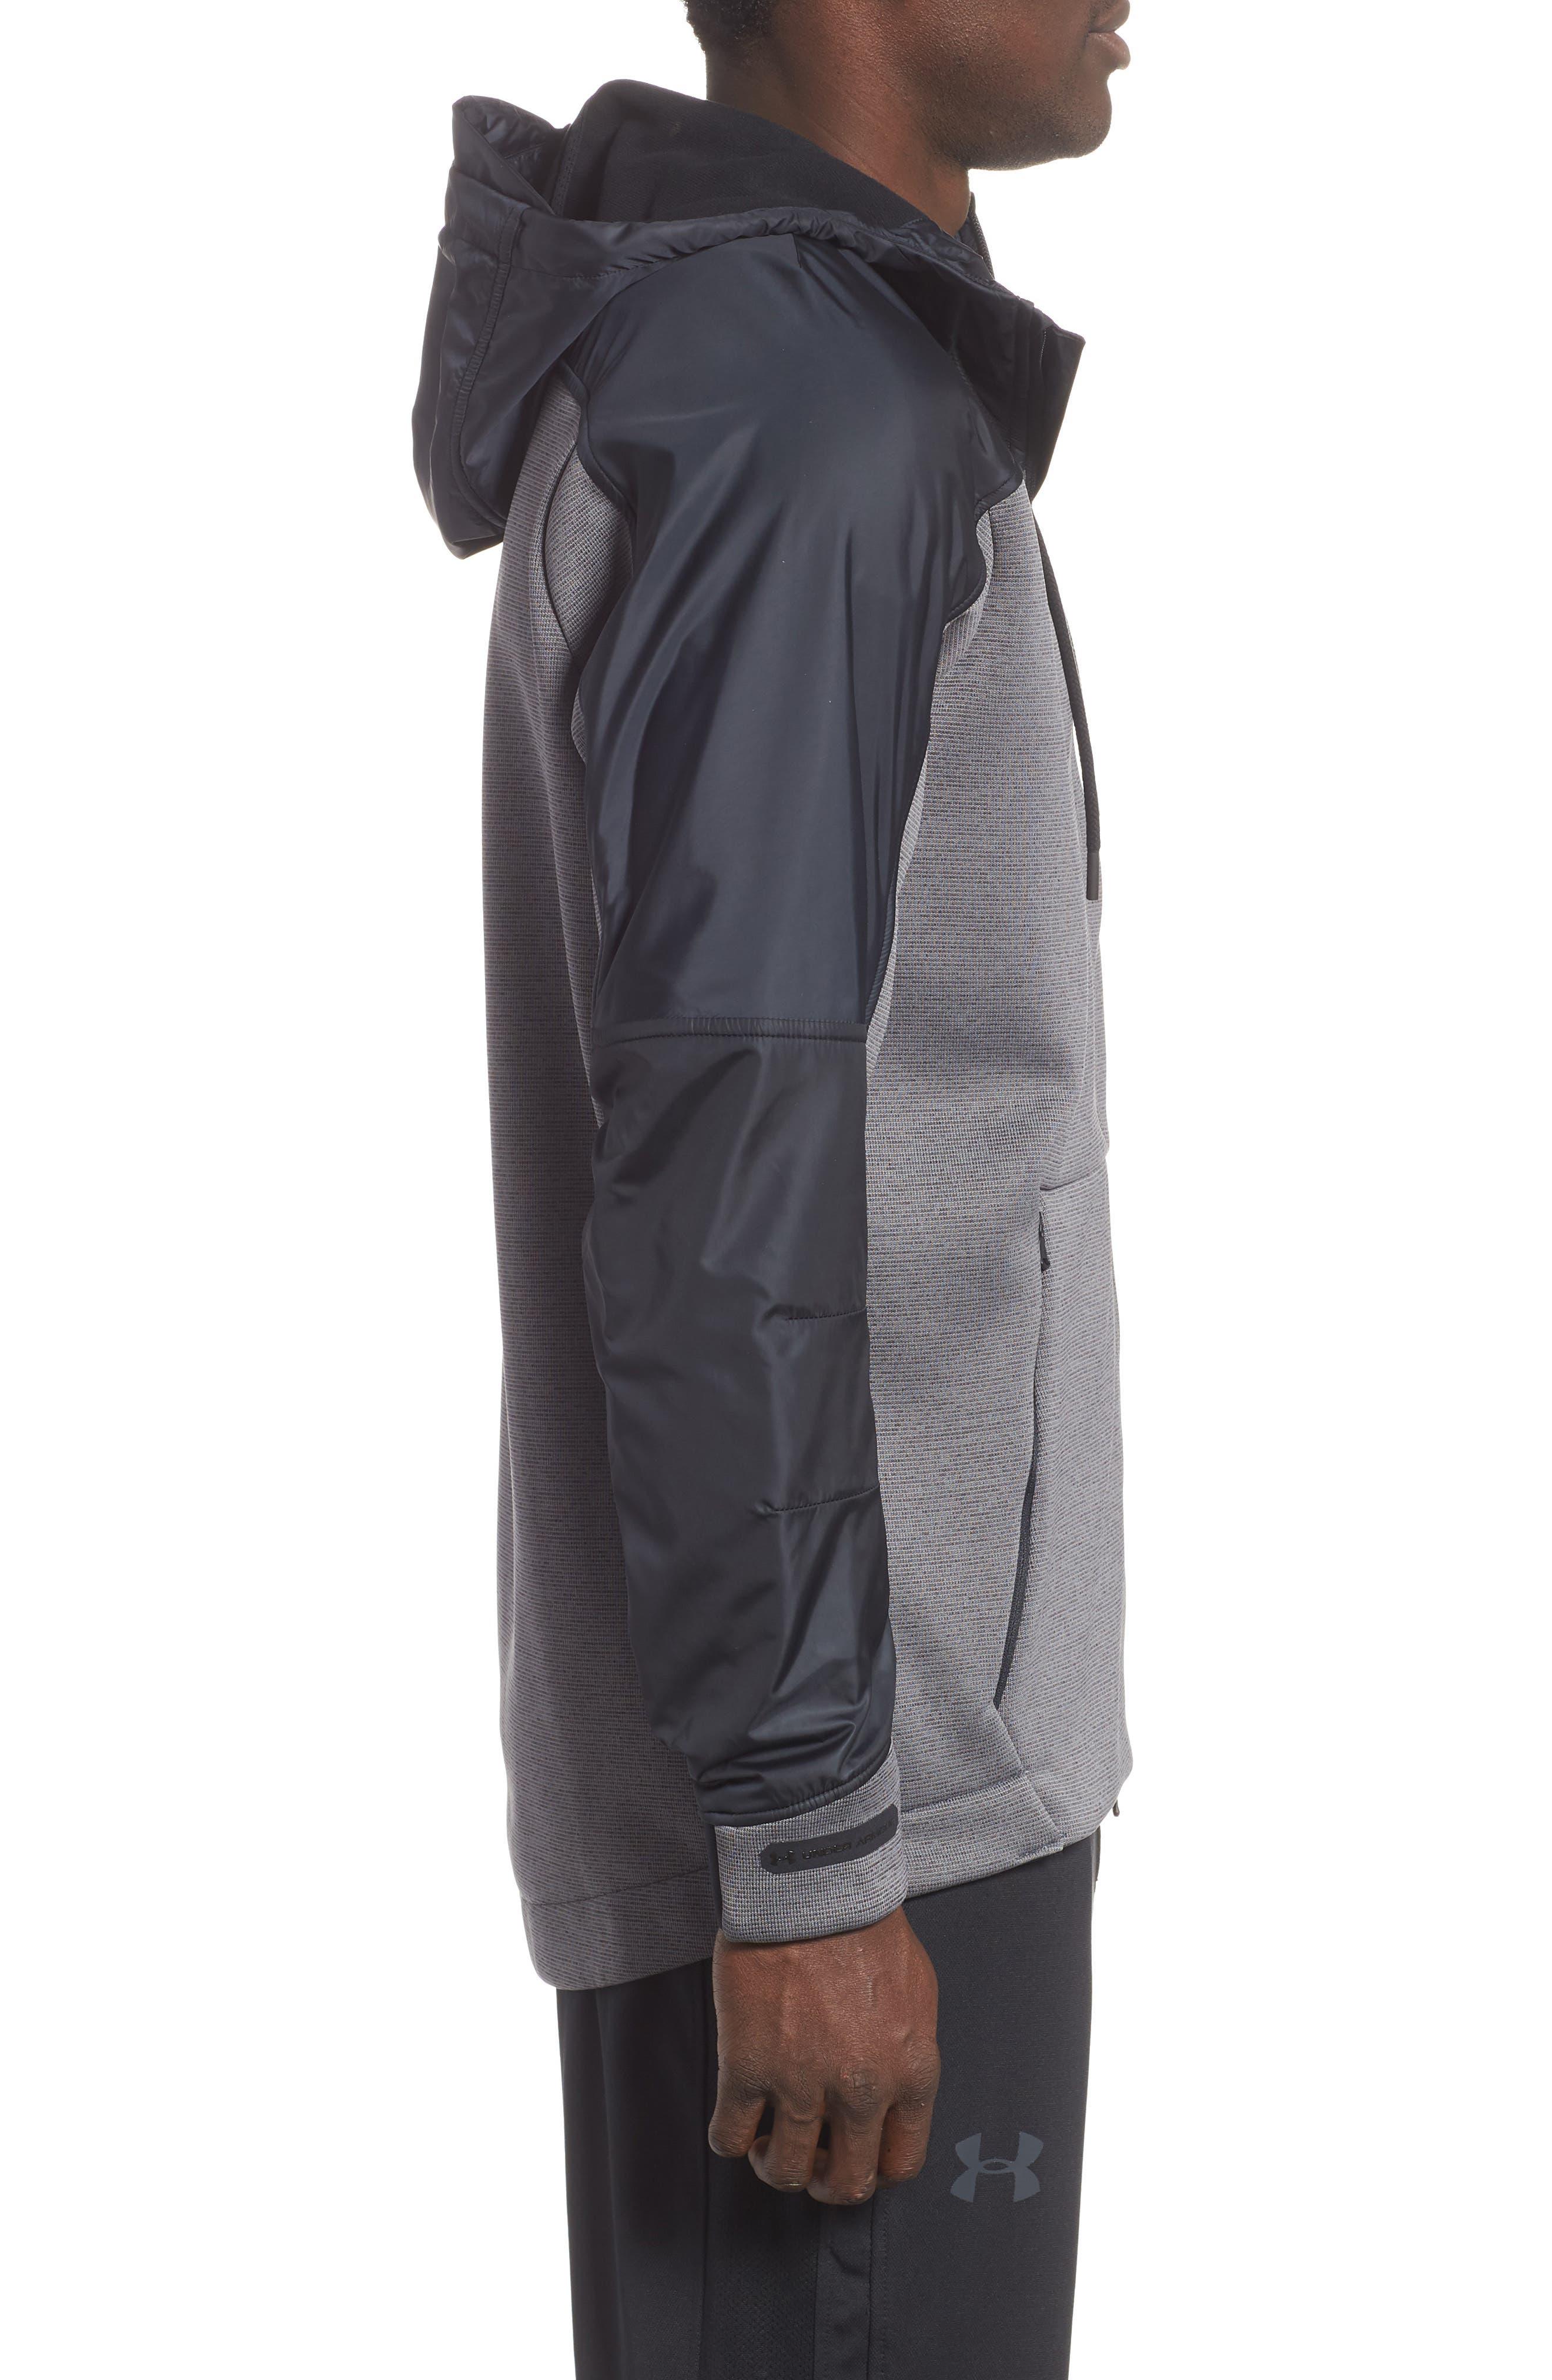 Unstoppable ColdGear<sup>®</sup> Jacket,                             Alternate thumbnail 3, color,                             CHARCOAL/ BLACK